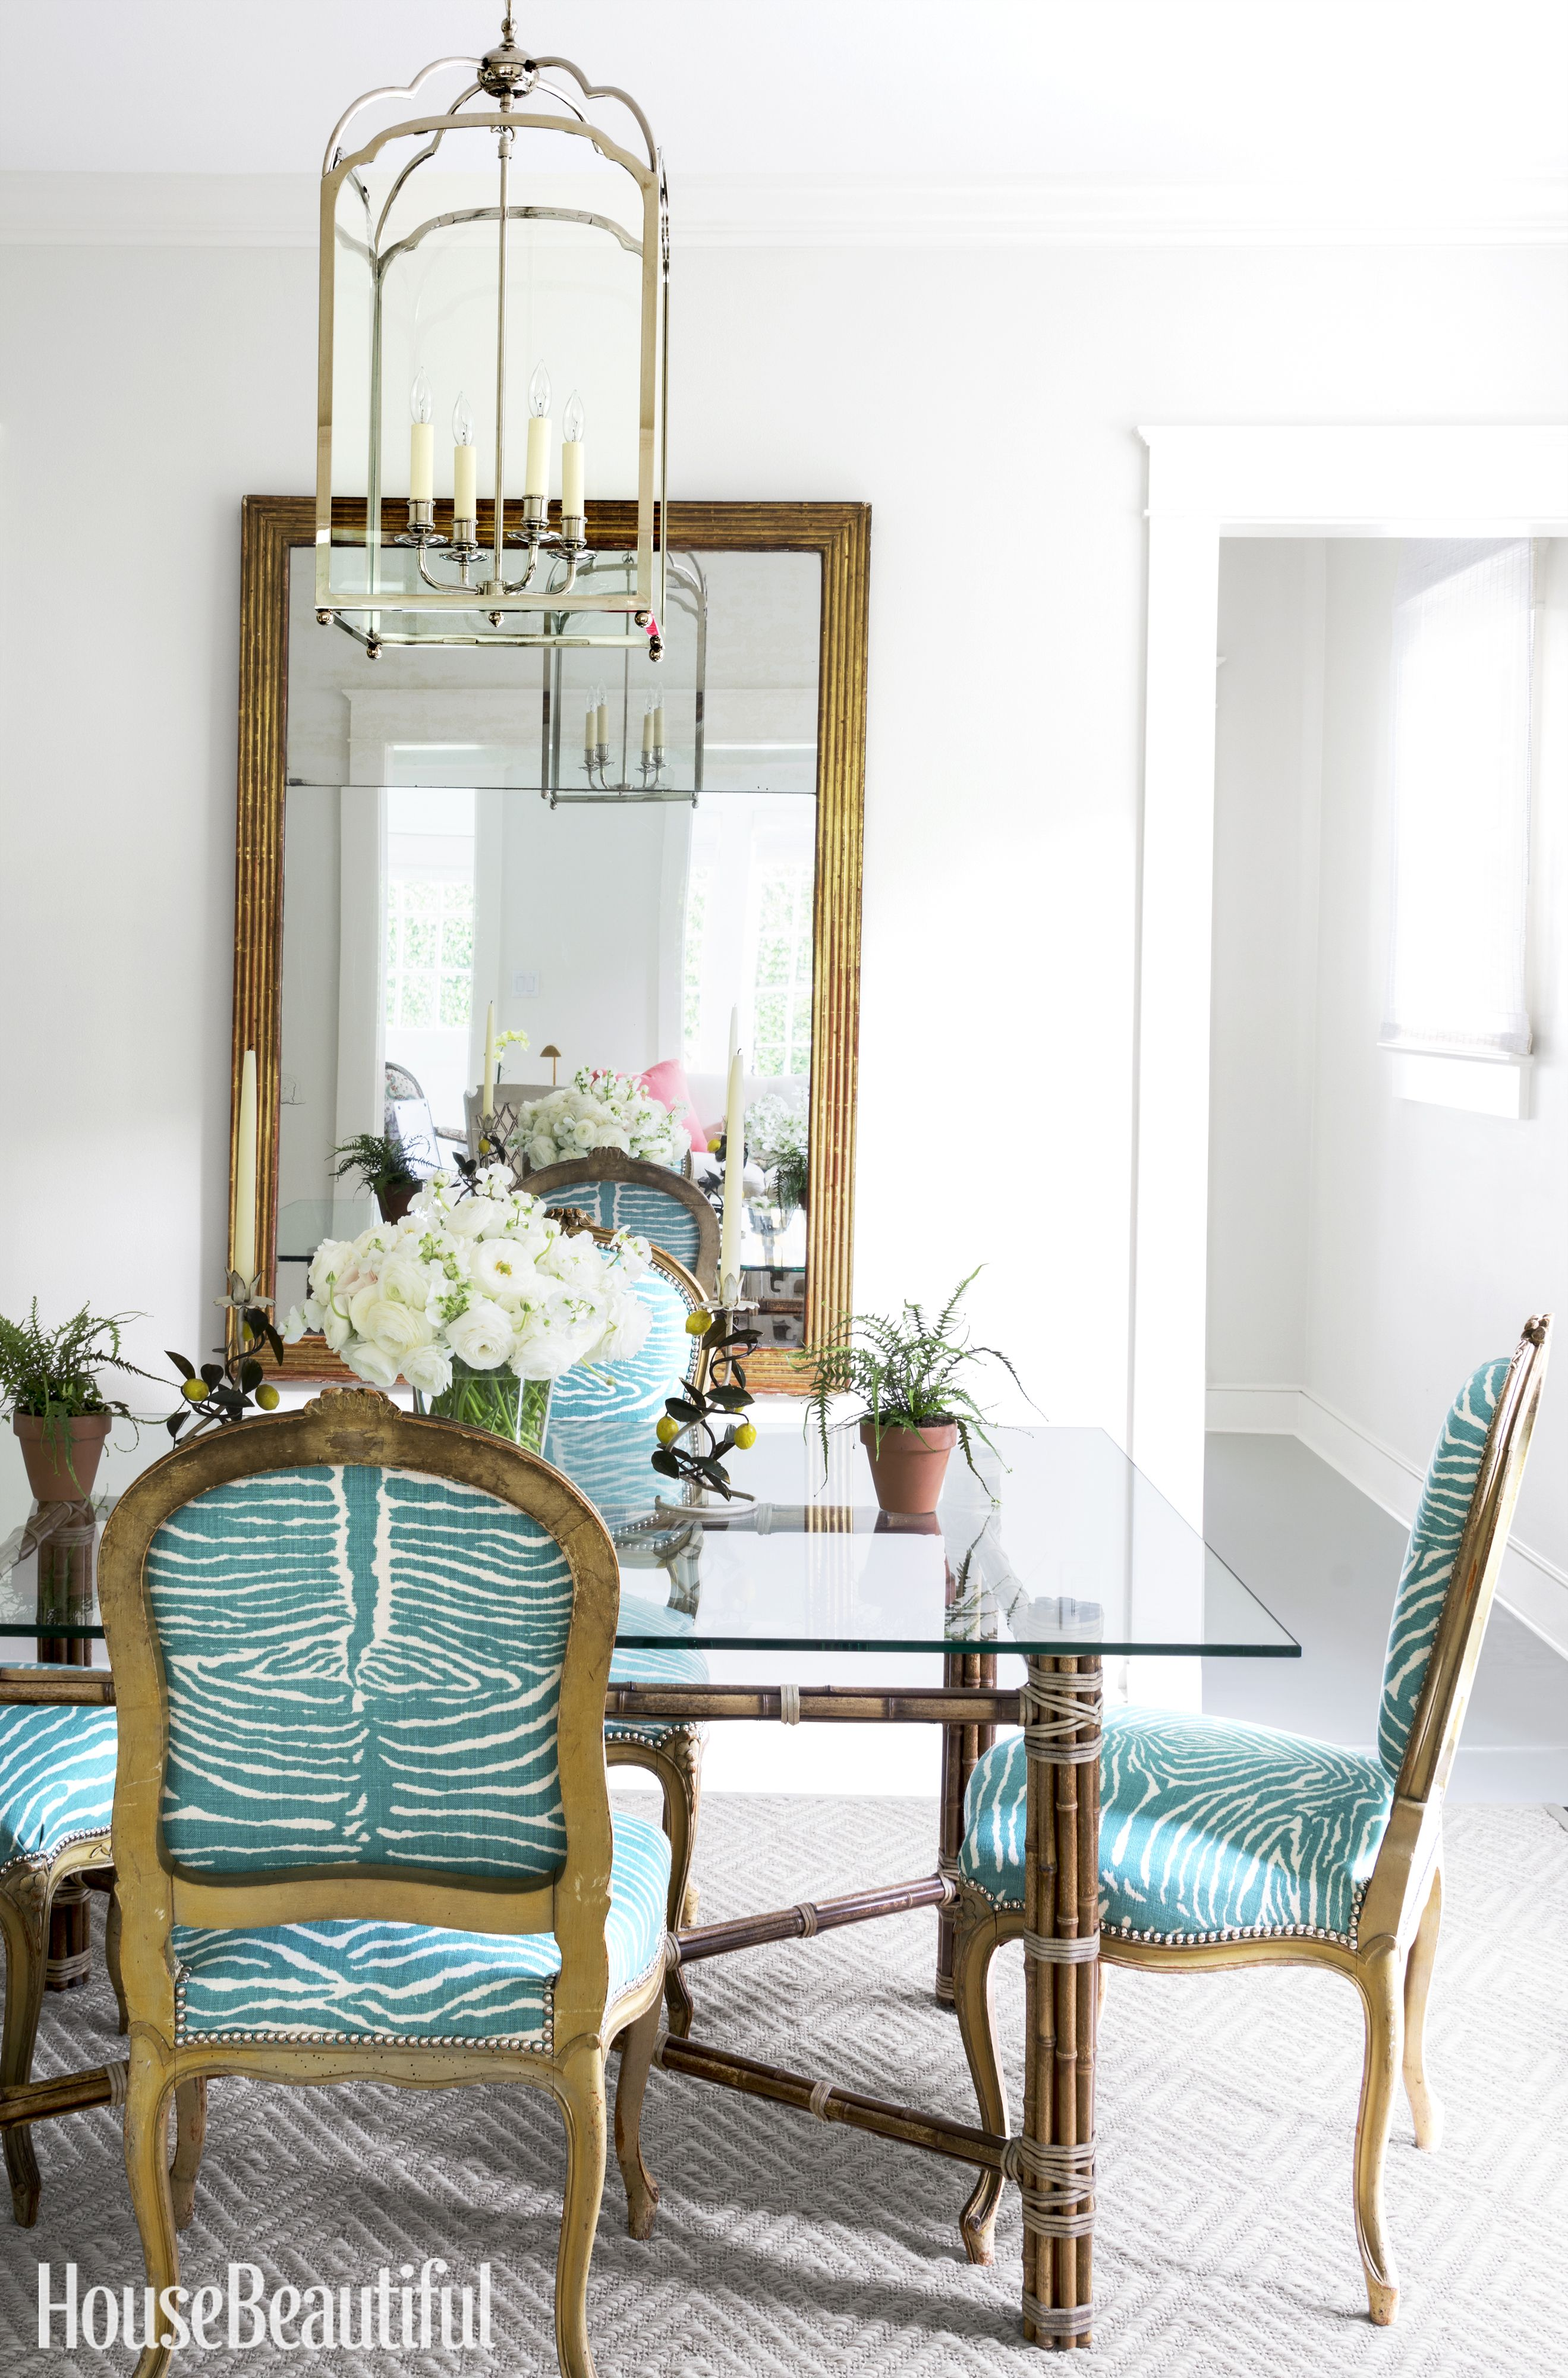 Designer Dining Room Furniture: Inside A Tiny Florida Cottage Full Of Tropical Colors